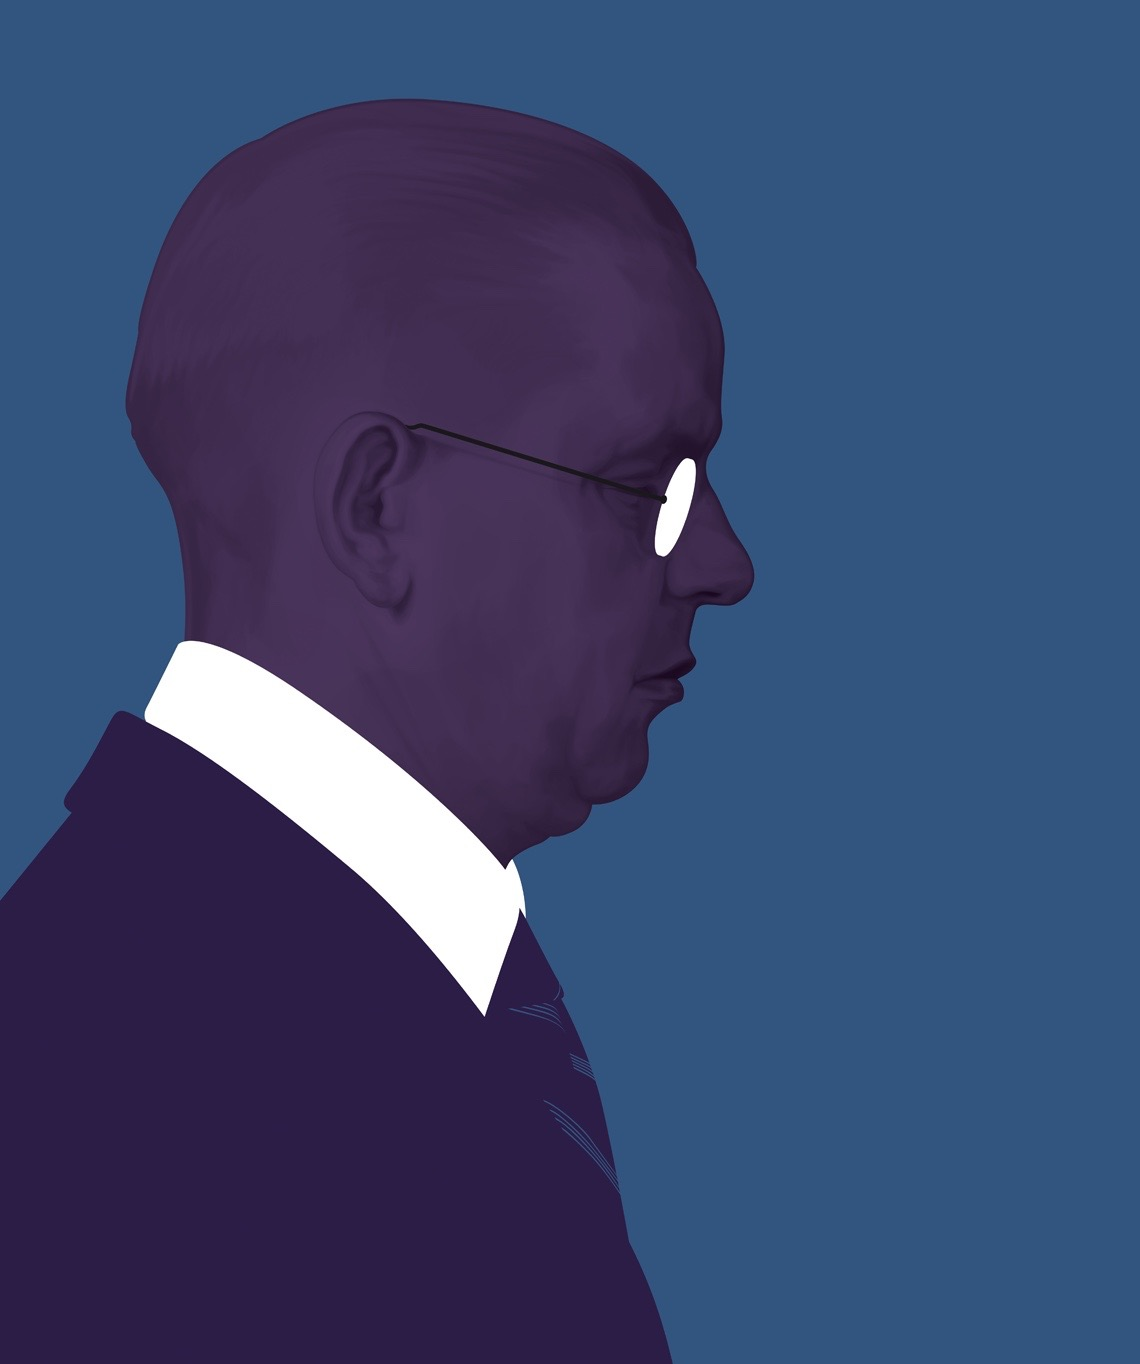 illustration, illustrations, illustrator, illustrators, man, men, glasses, balding, suit, profile, side view, monochromatic, serious, expression